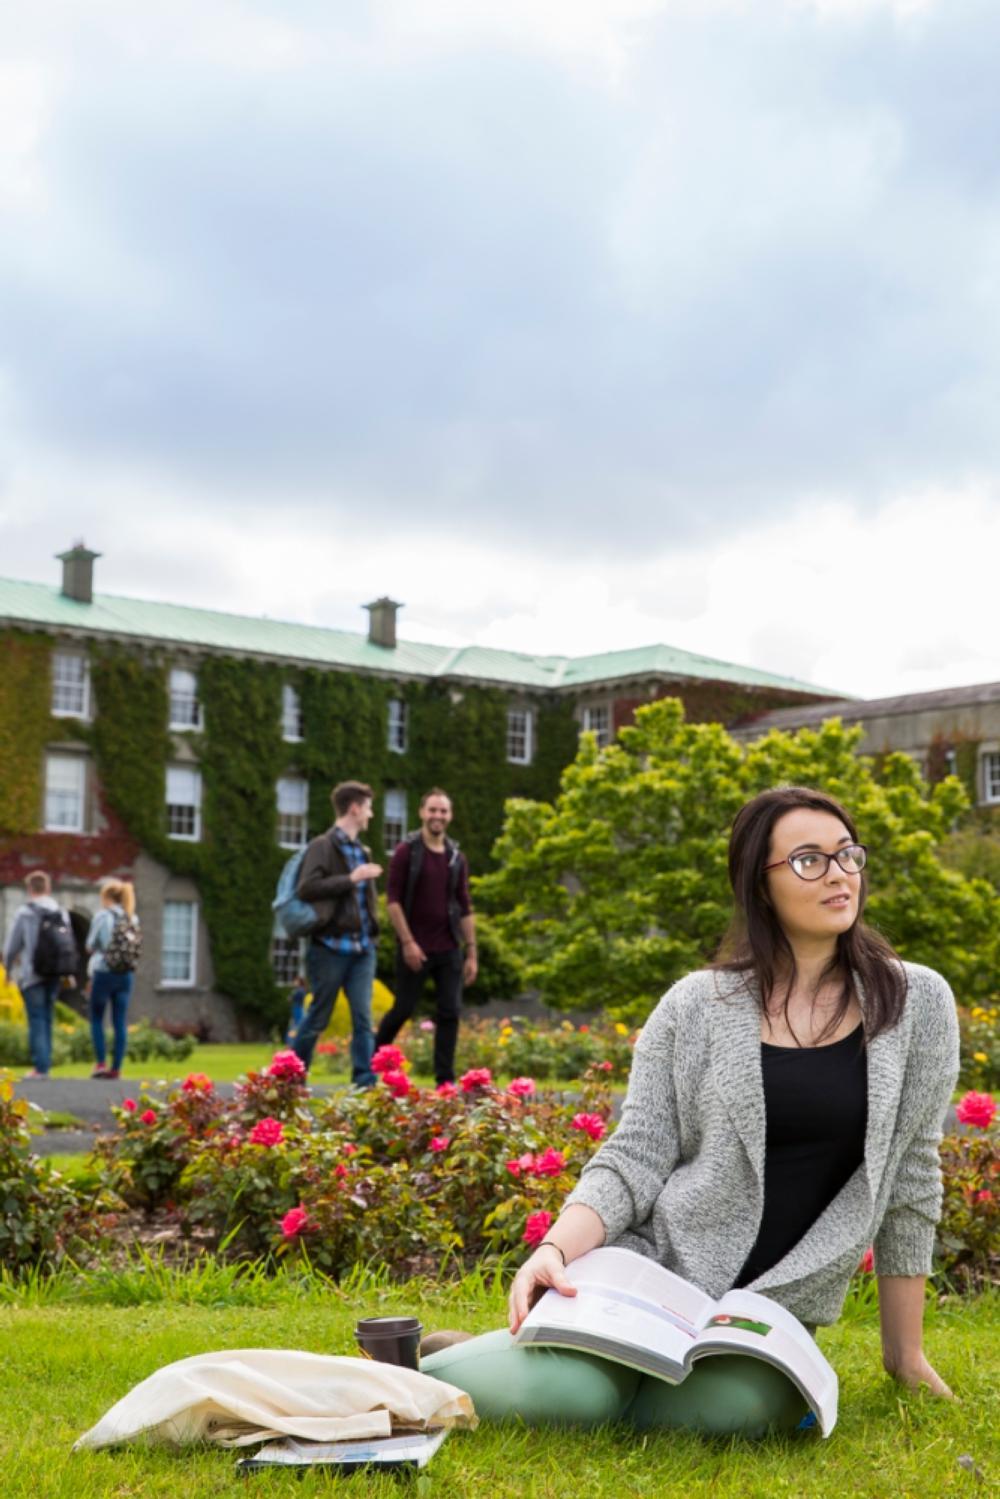 IRISH RETURN MIGRATION FROM AMERICA AT THE TURN